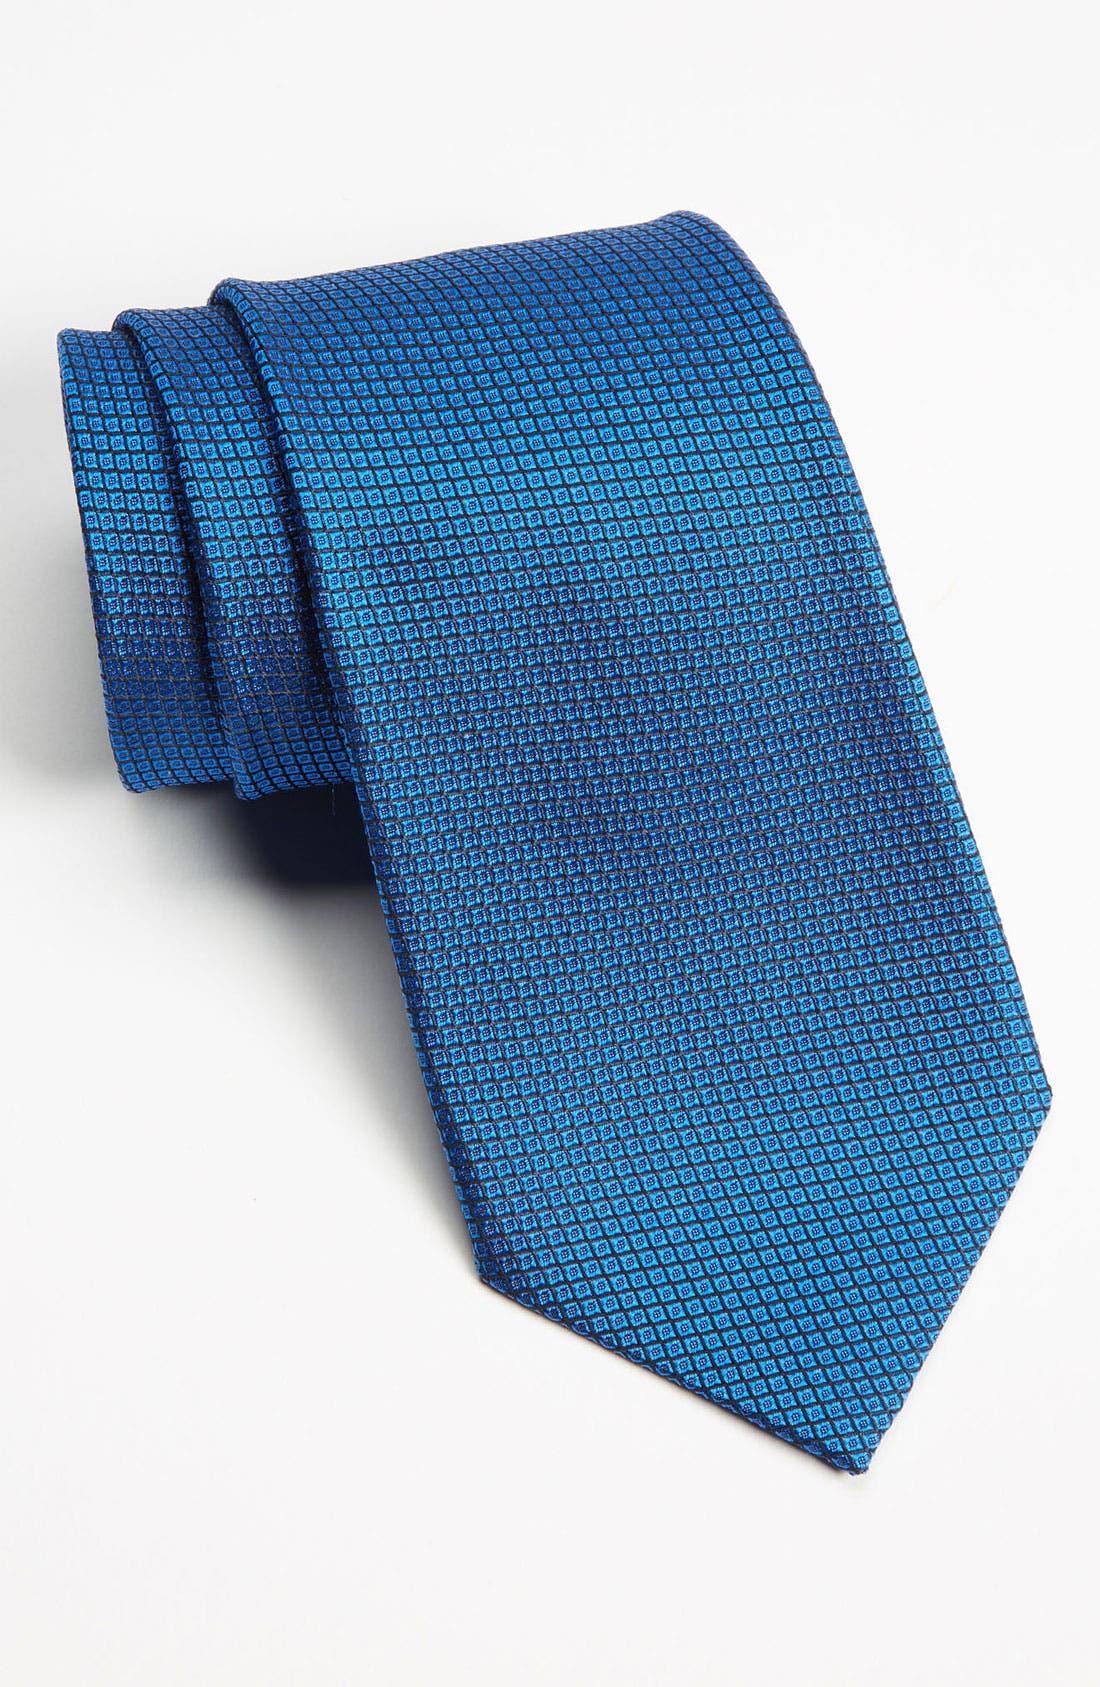 Main Image - Z Zegna Bird's Eye Silk Woven Tie